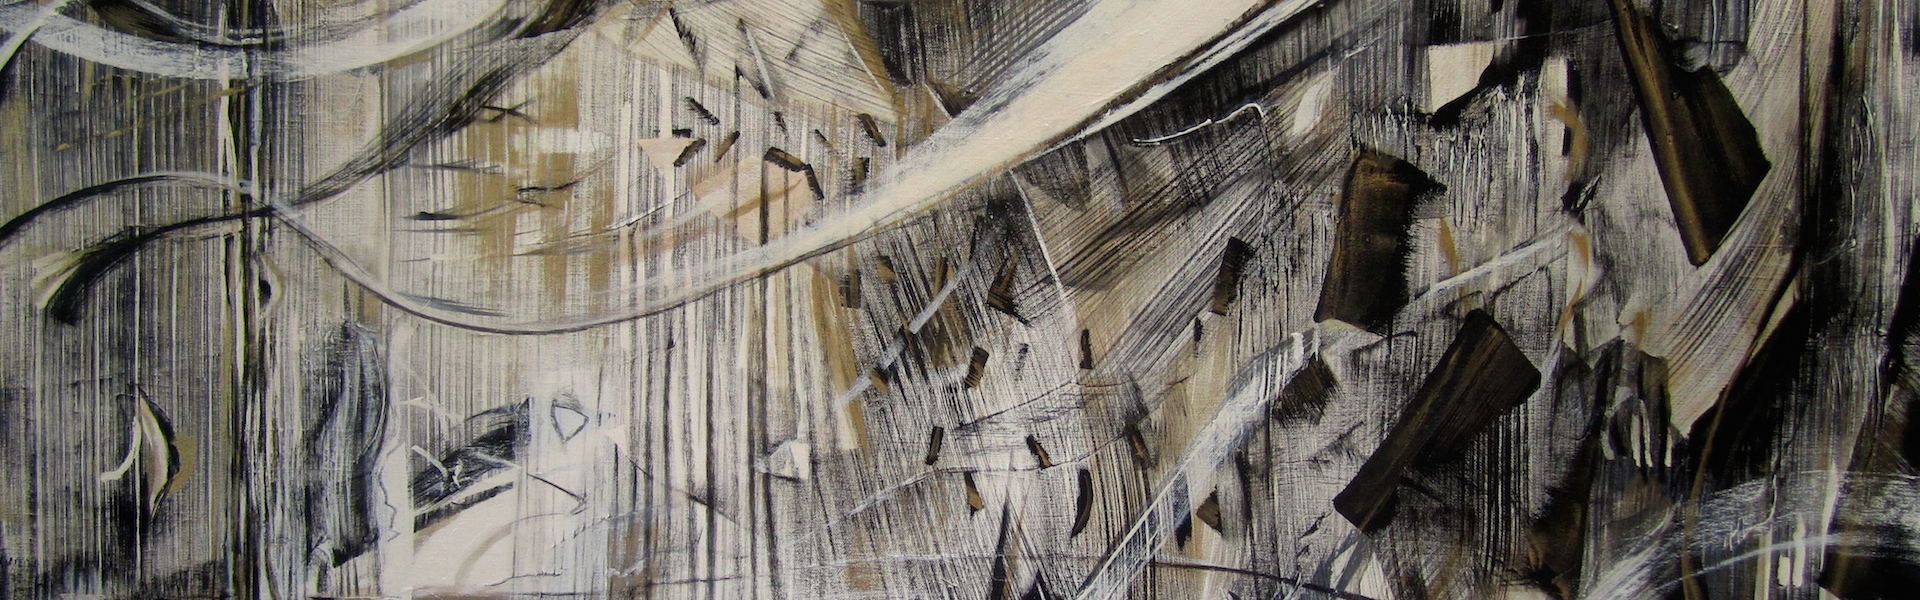 banner_Sound-Passage-30-22-x-48-25-22-Acrylic-on-Canvas.20210510111712.jpg